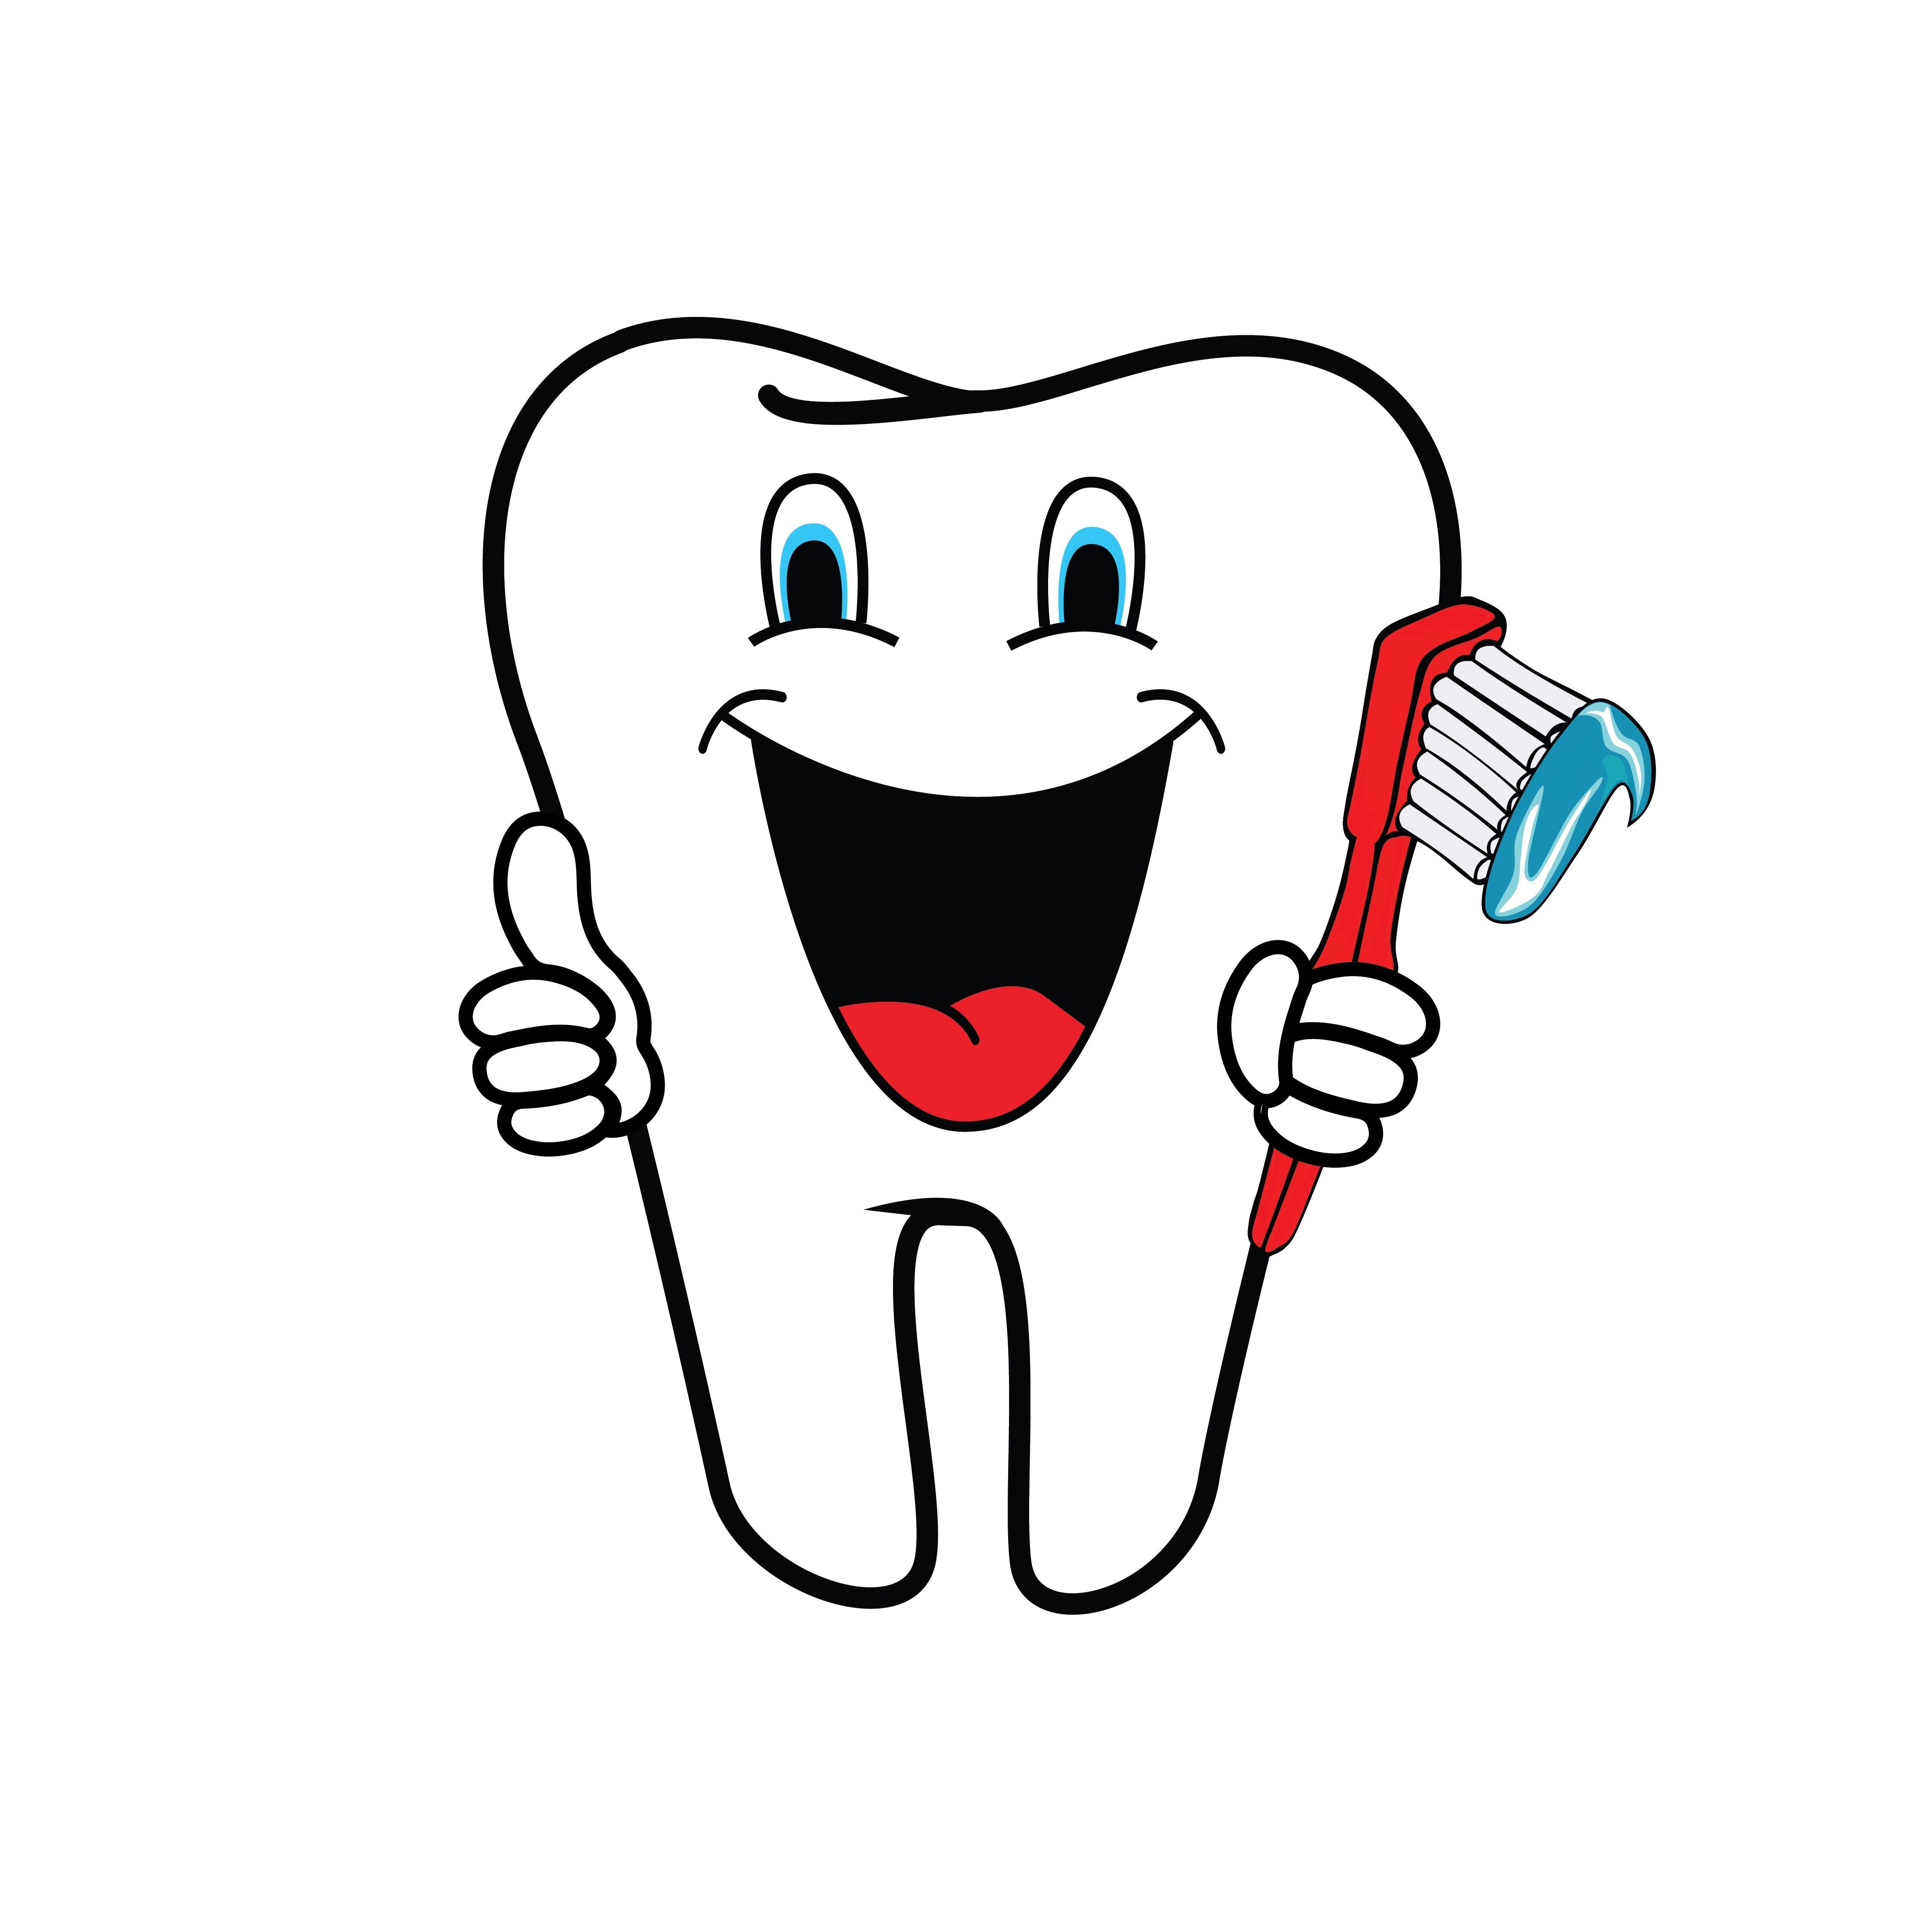 Diente clipart image black and white stock Foto de stock gratuita sobre cepillo de dientes, clipart diente ... image black and white stock